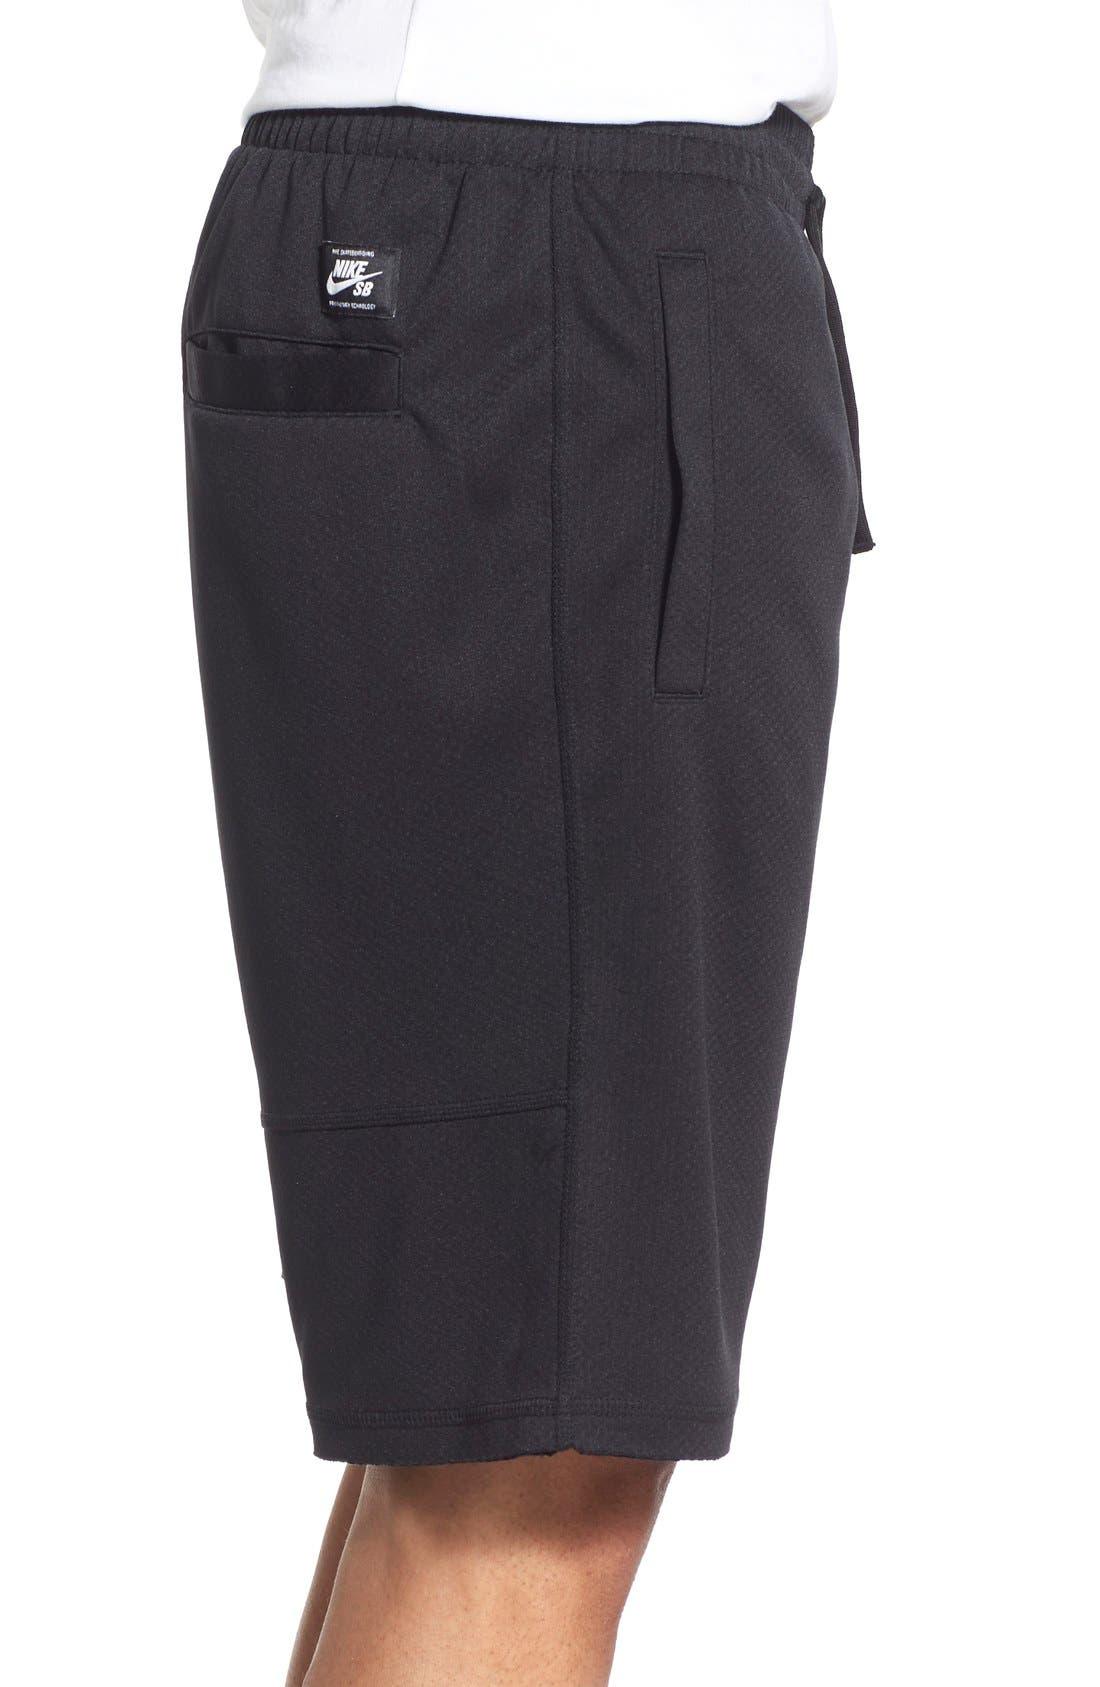 Alternate Image 3  - Nike SB 'Stripe Sunday' Dri-FIT Shorts